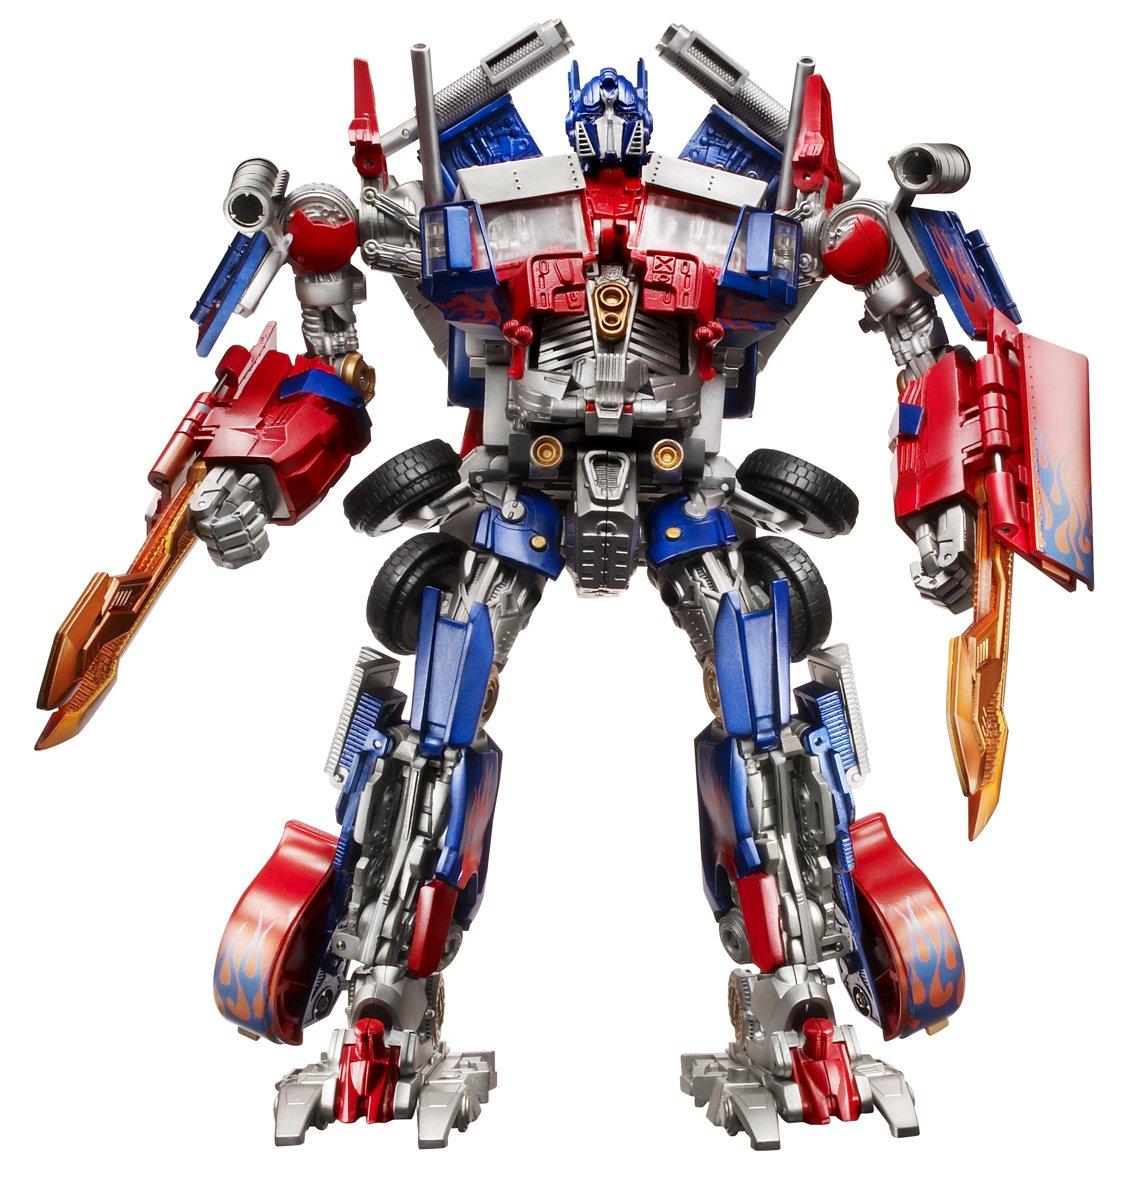 New Transformers Revenge Of The Fallen Toys 42